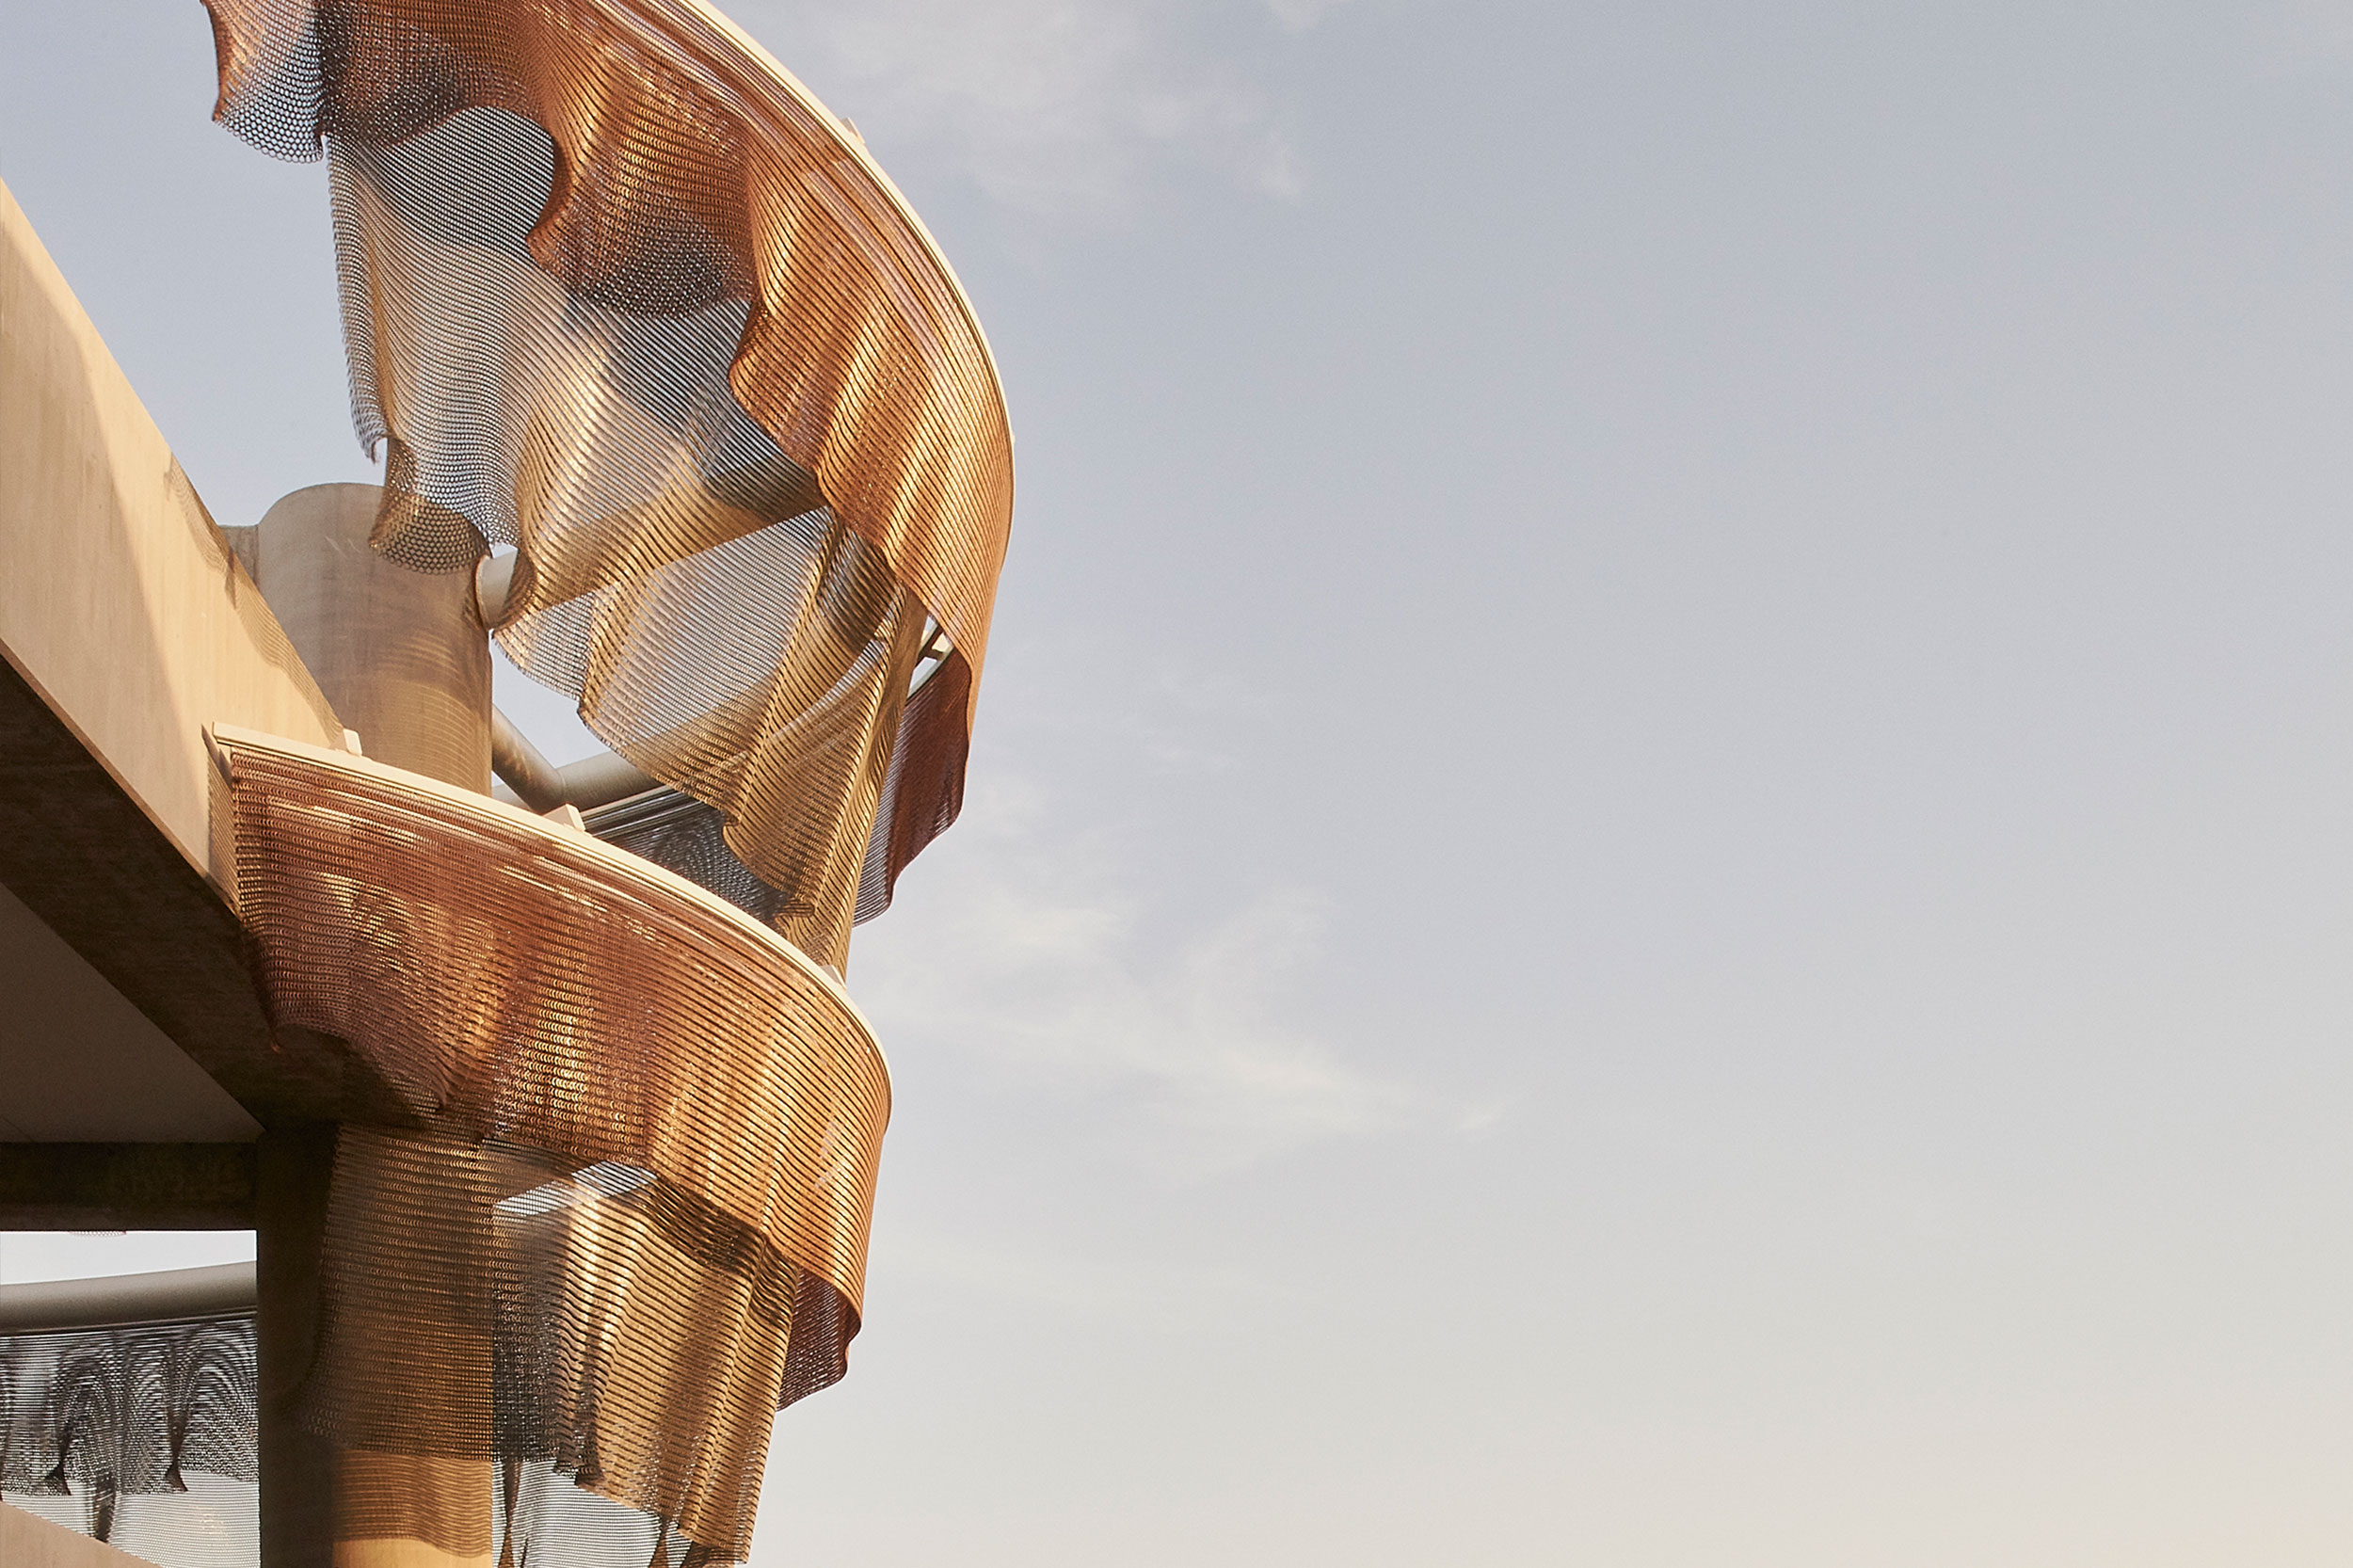 Kinetic Facade—Enagua Plaza at Playa Vista, LA designed by Ned Kahn